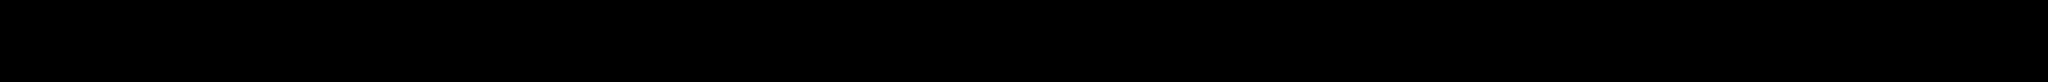 TRIXIE Κιγκλίδωμα προστασίας πορτμπαγκάζ / χώρος φόρτωσης